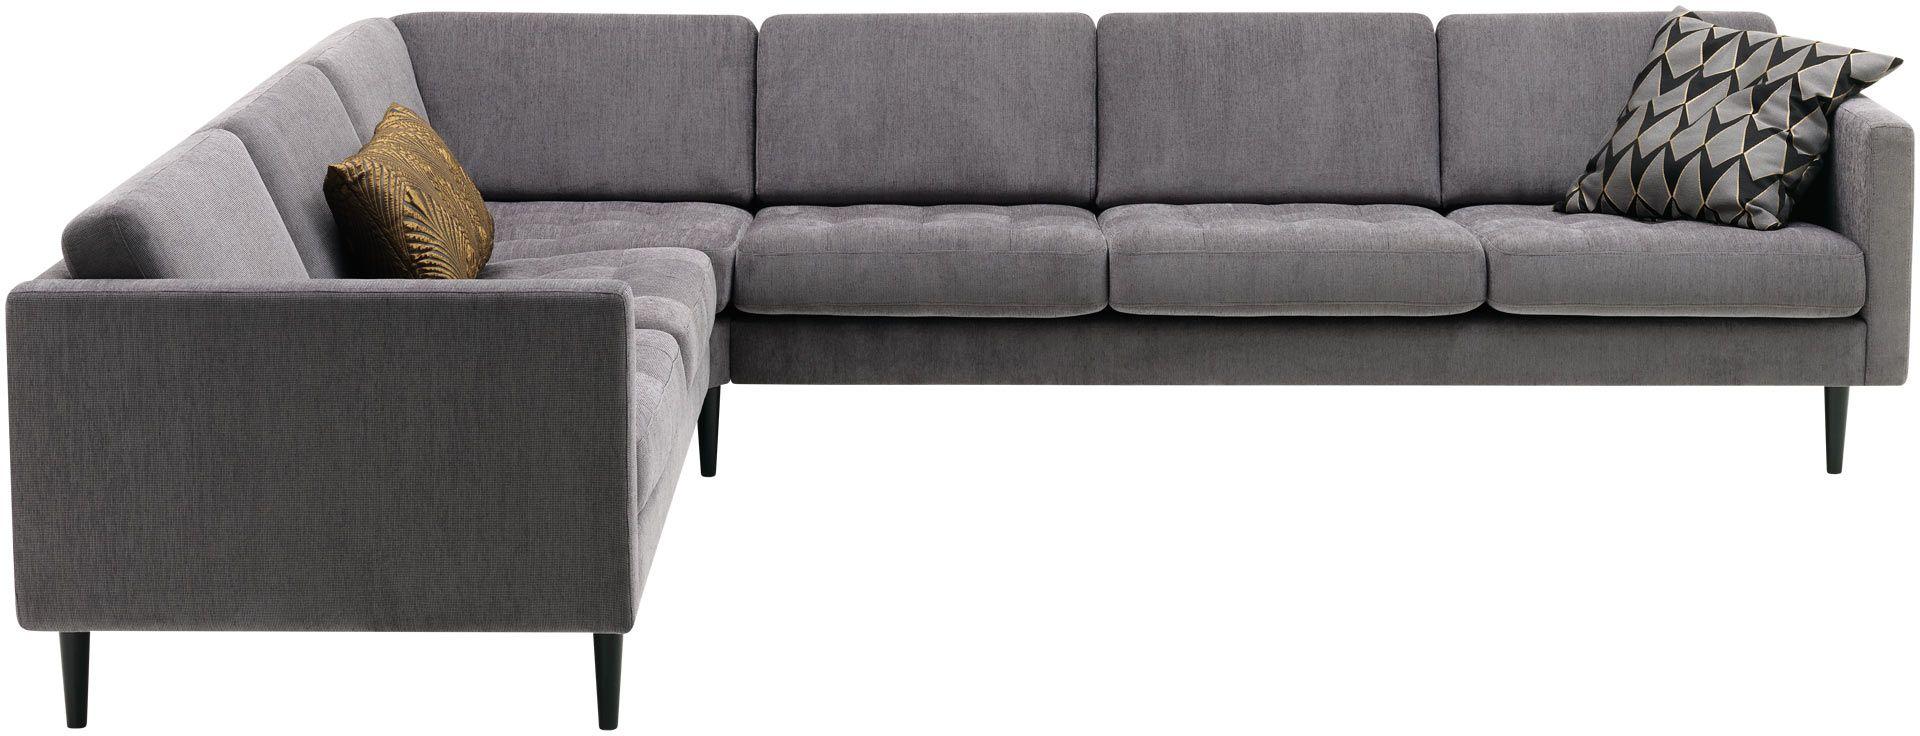 modern corner sofas quality from boconcept couches corner sofa rh pinterest com au